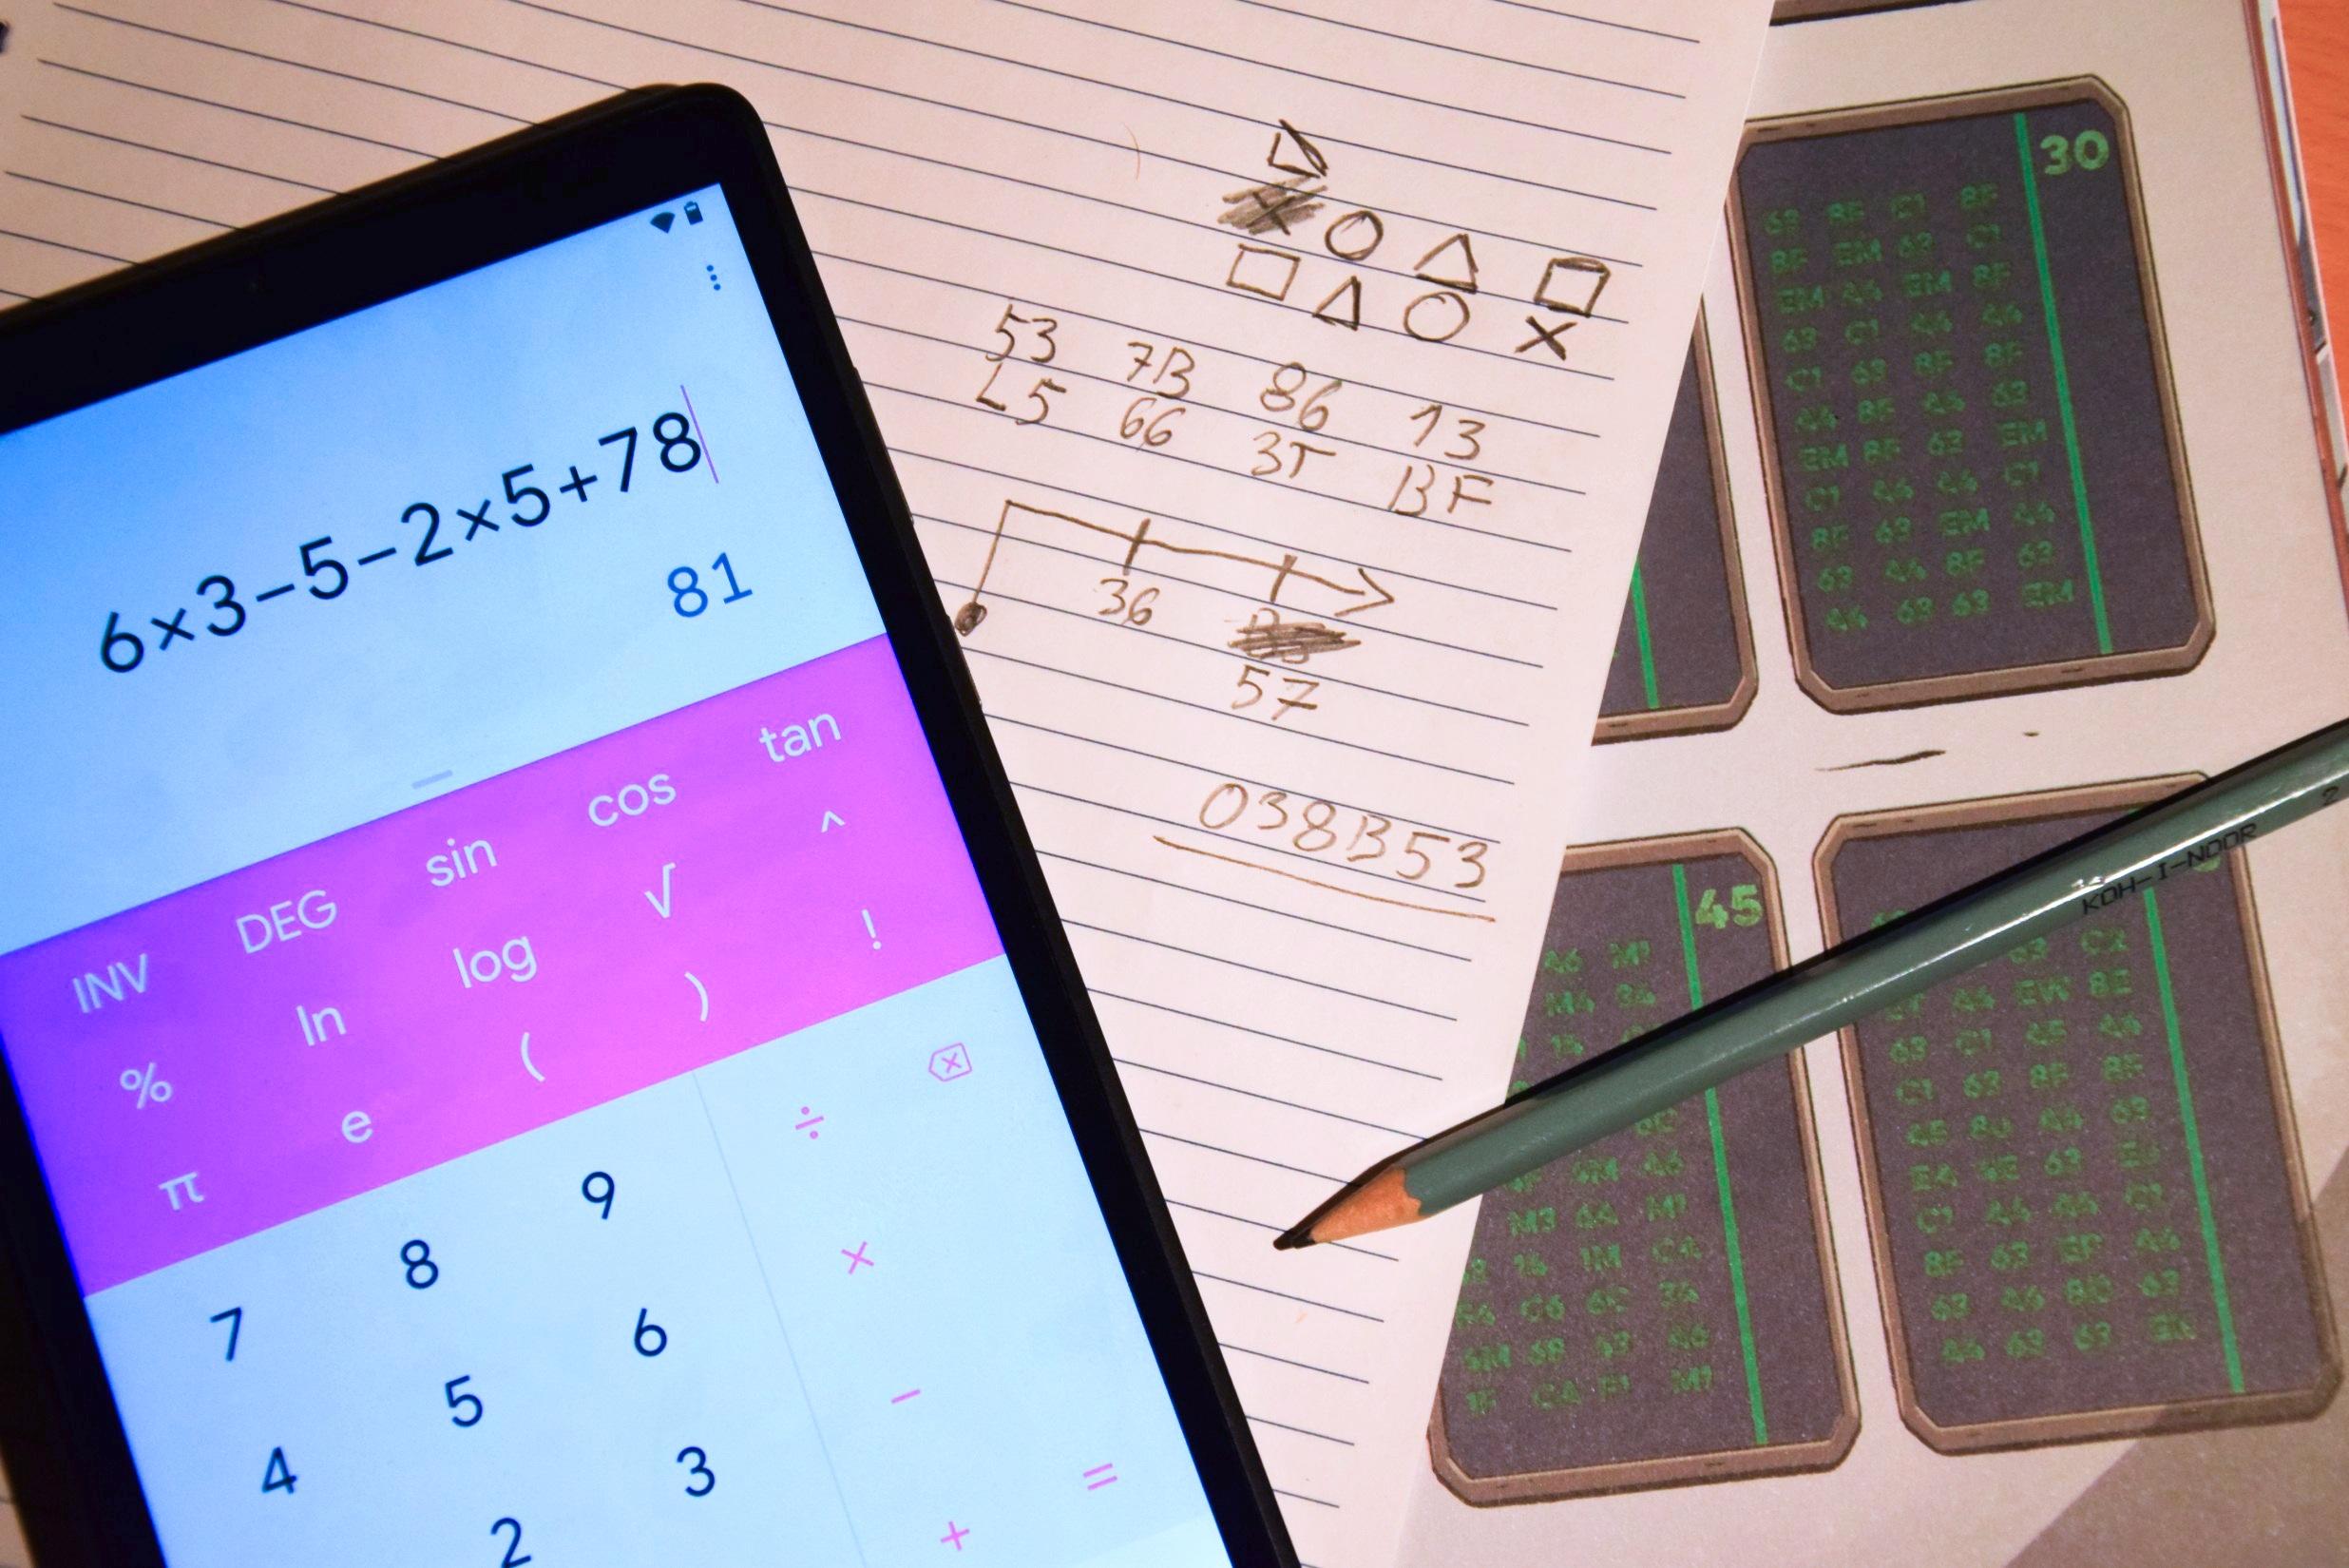 Pripravte si vaše kombinatorické schopnosti a starostlivo si zapisujte čísla! (Foto: Pop-Cult Magazín)